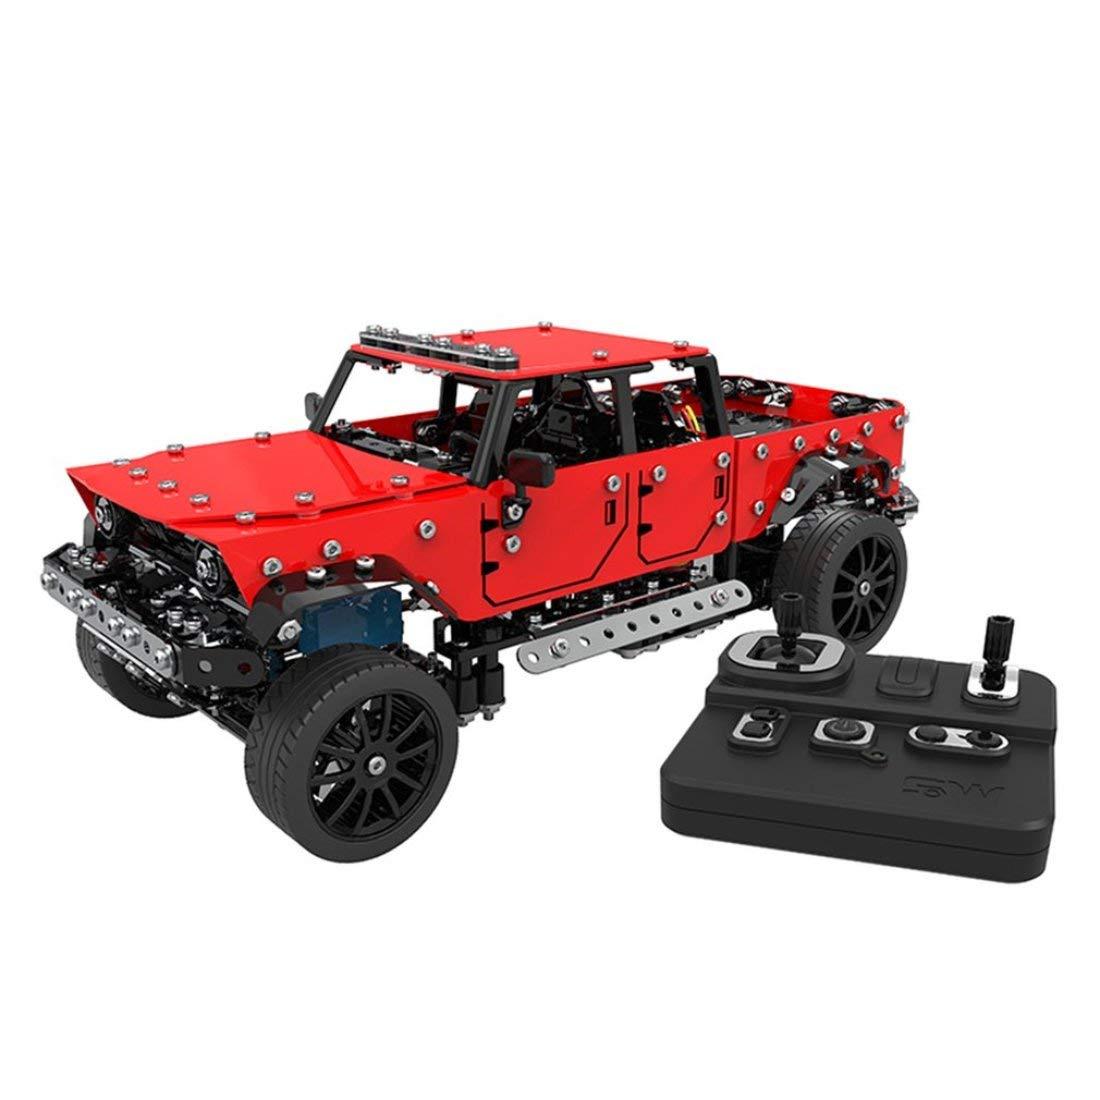 Formulaone Steel World 2.4ghz 8 Kanäle Kanäle Kanäle USB-Ladebaustein DIY BAU Fernbedienung Jeep Geländewagen RC Autos - Rot 75e128